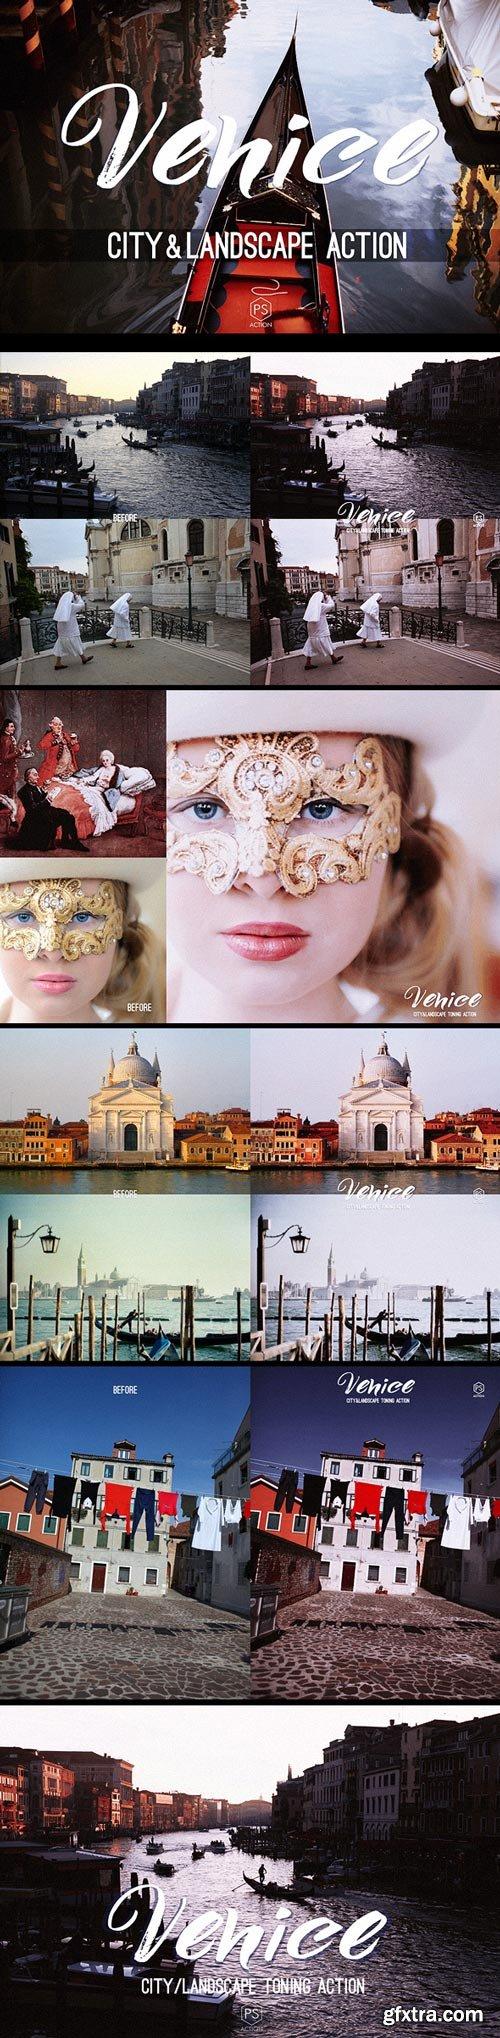 GraphicRiver - Venice Landscape Photoshop Action - atmospheric toning for urban, cityscape & landscape photography - 15562778